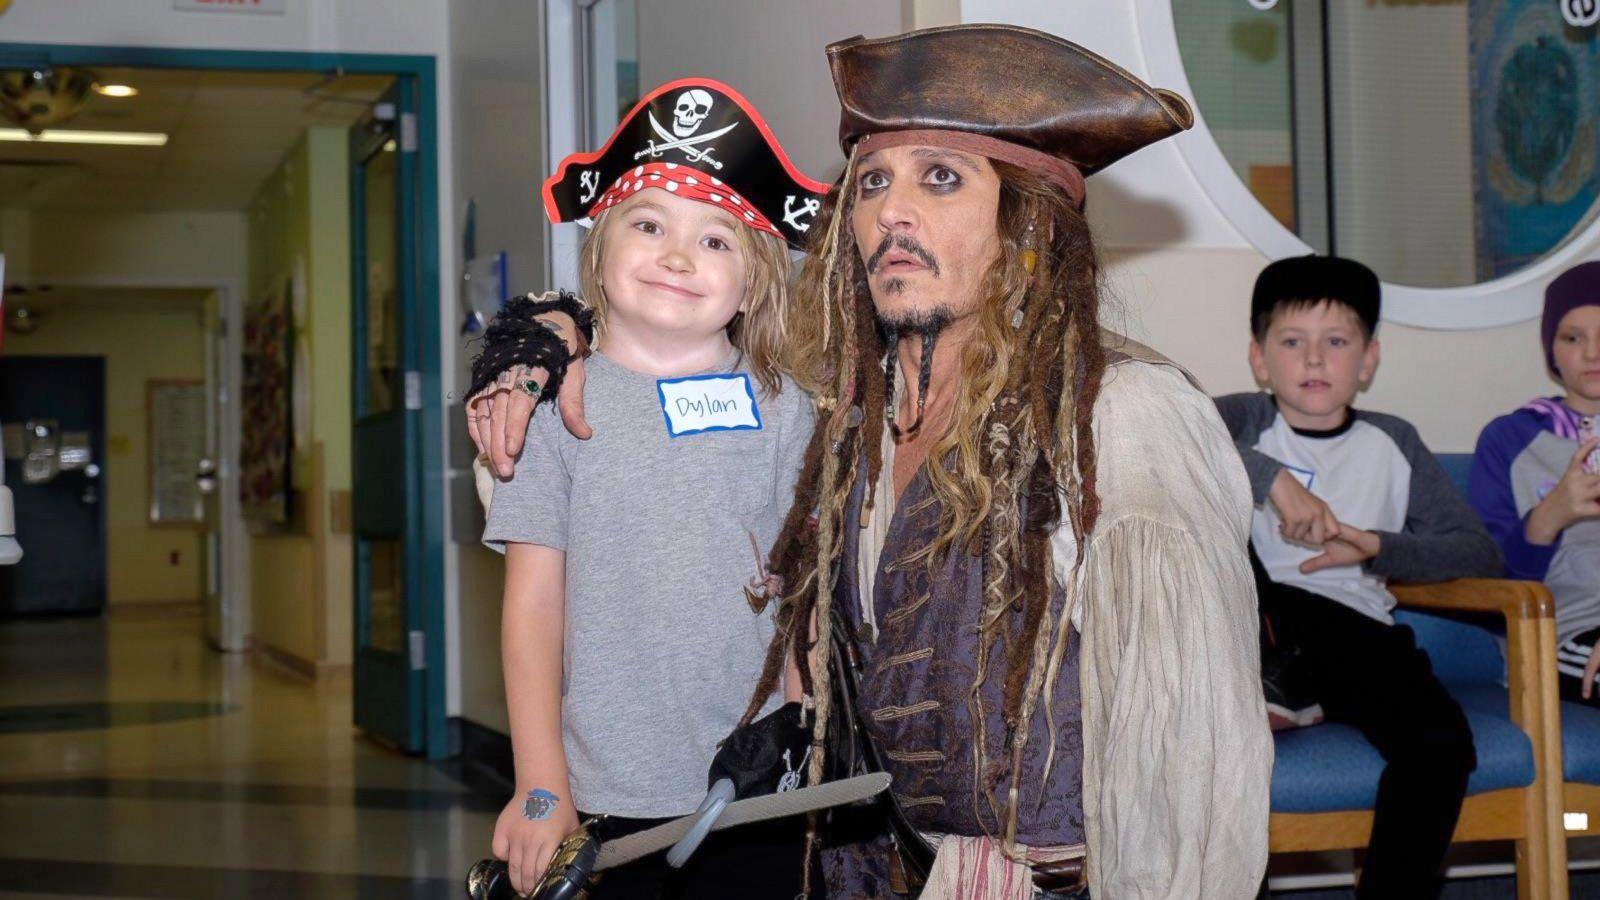 Johnny Depp Visits Childrnes Hospital Dressed As Captain Jack Abc